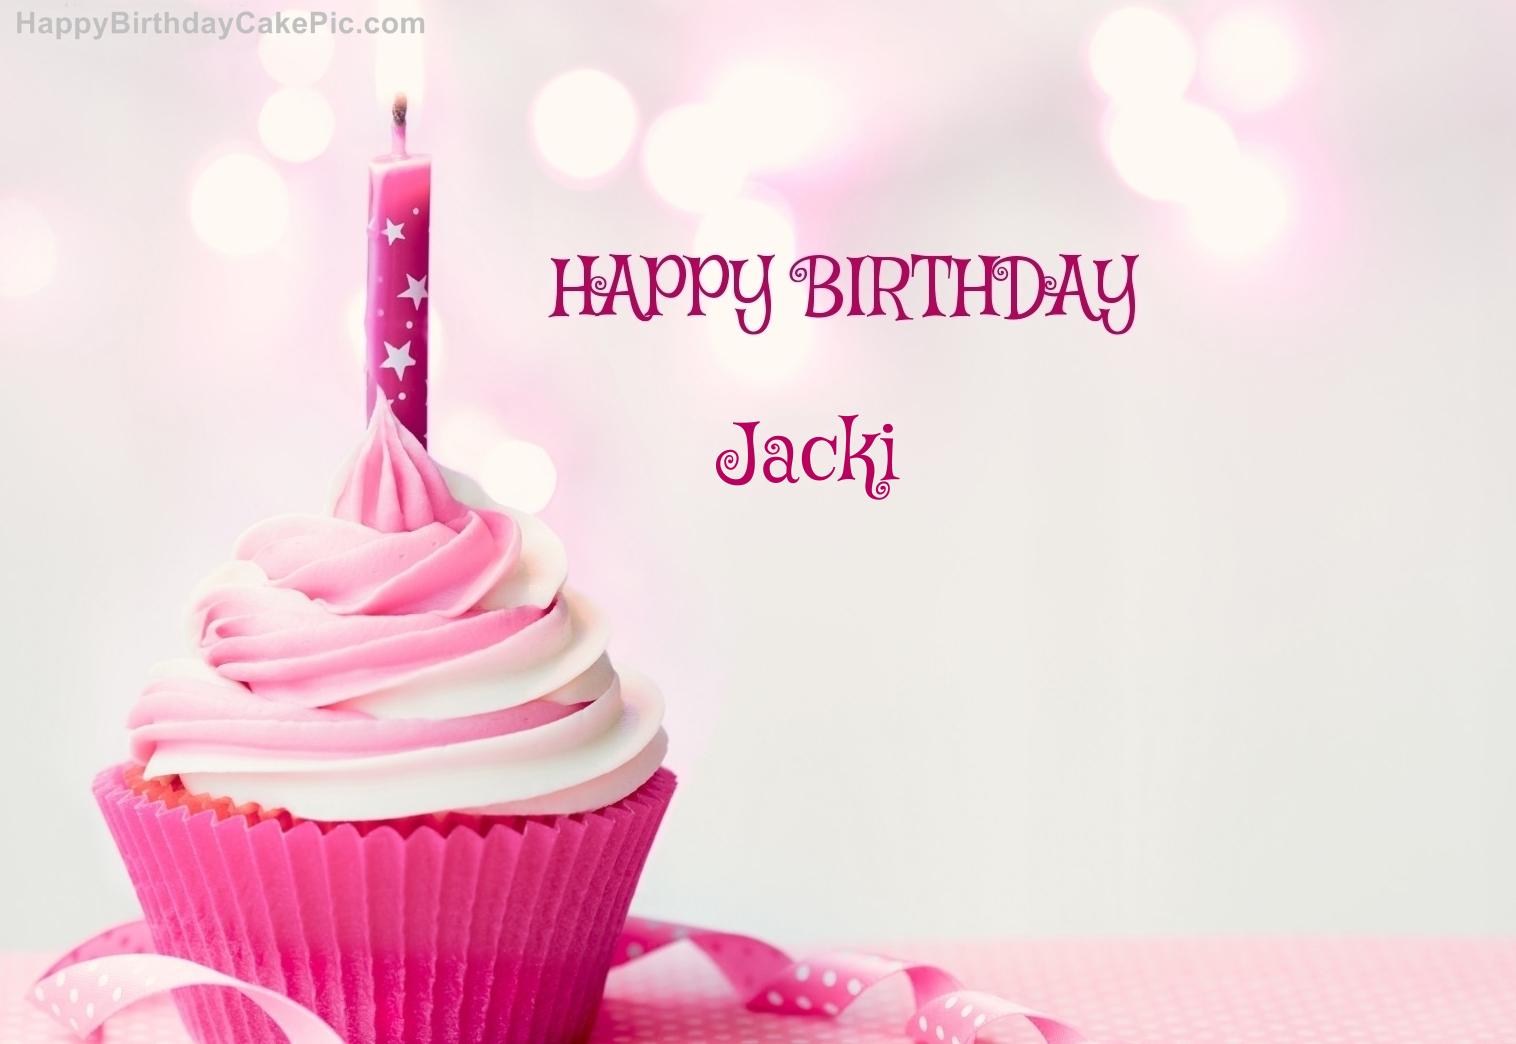 Image result for happy birthday jacki